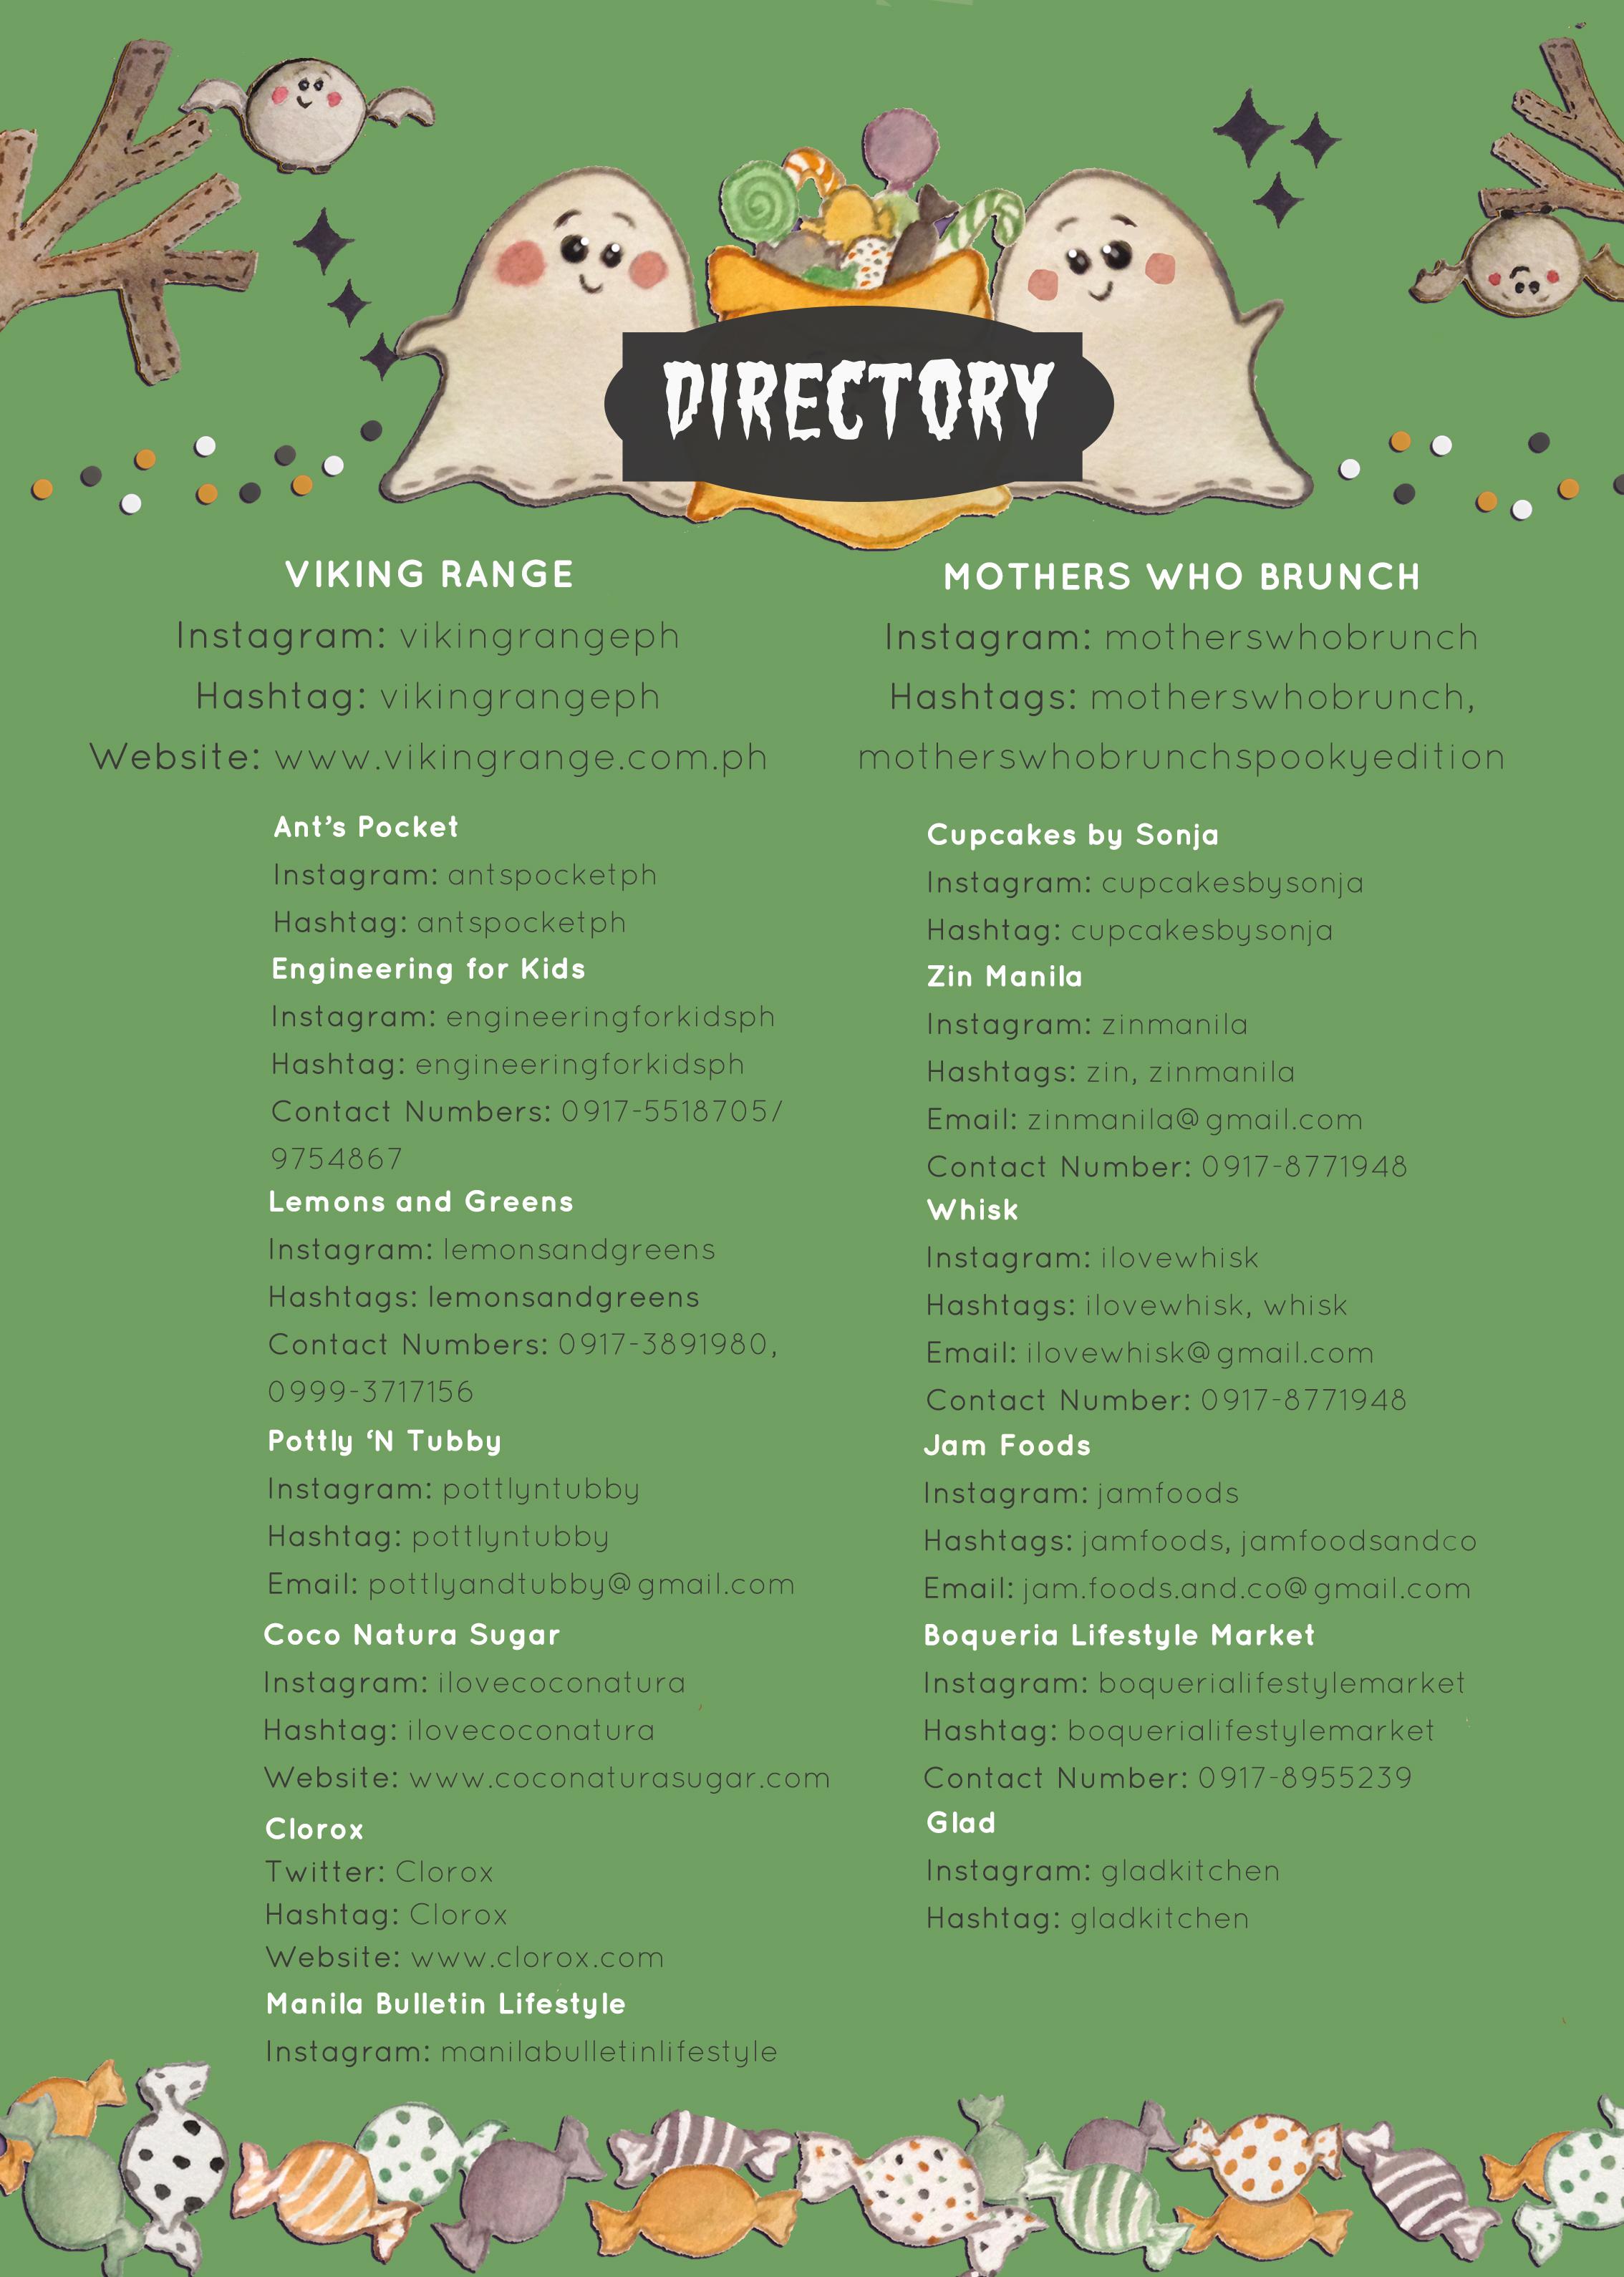 Copy-of-MWB-SE-Directory.jpg